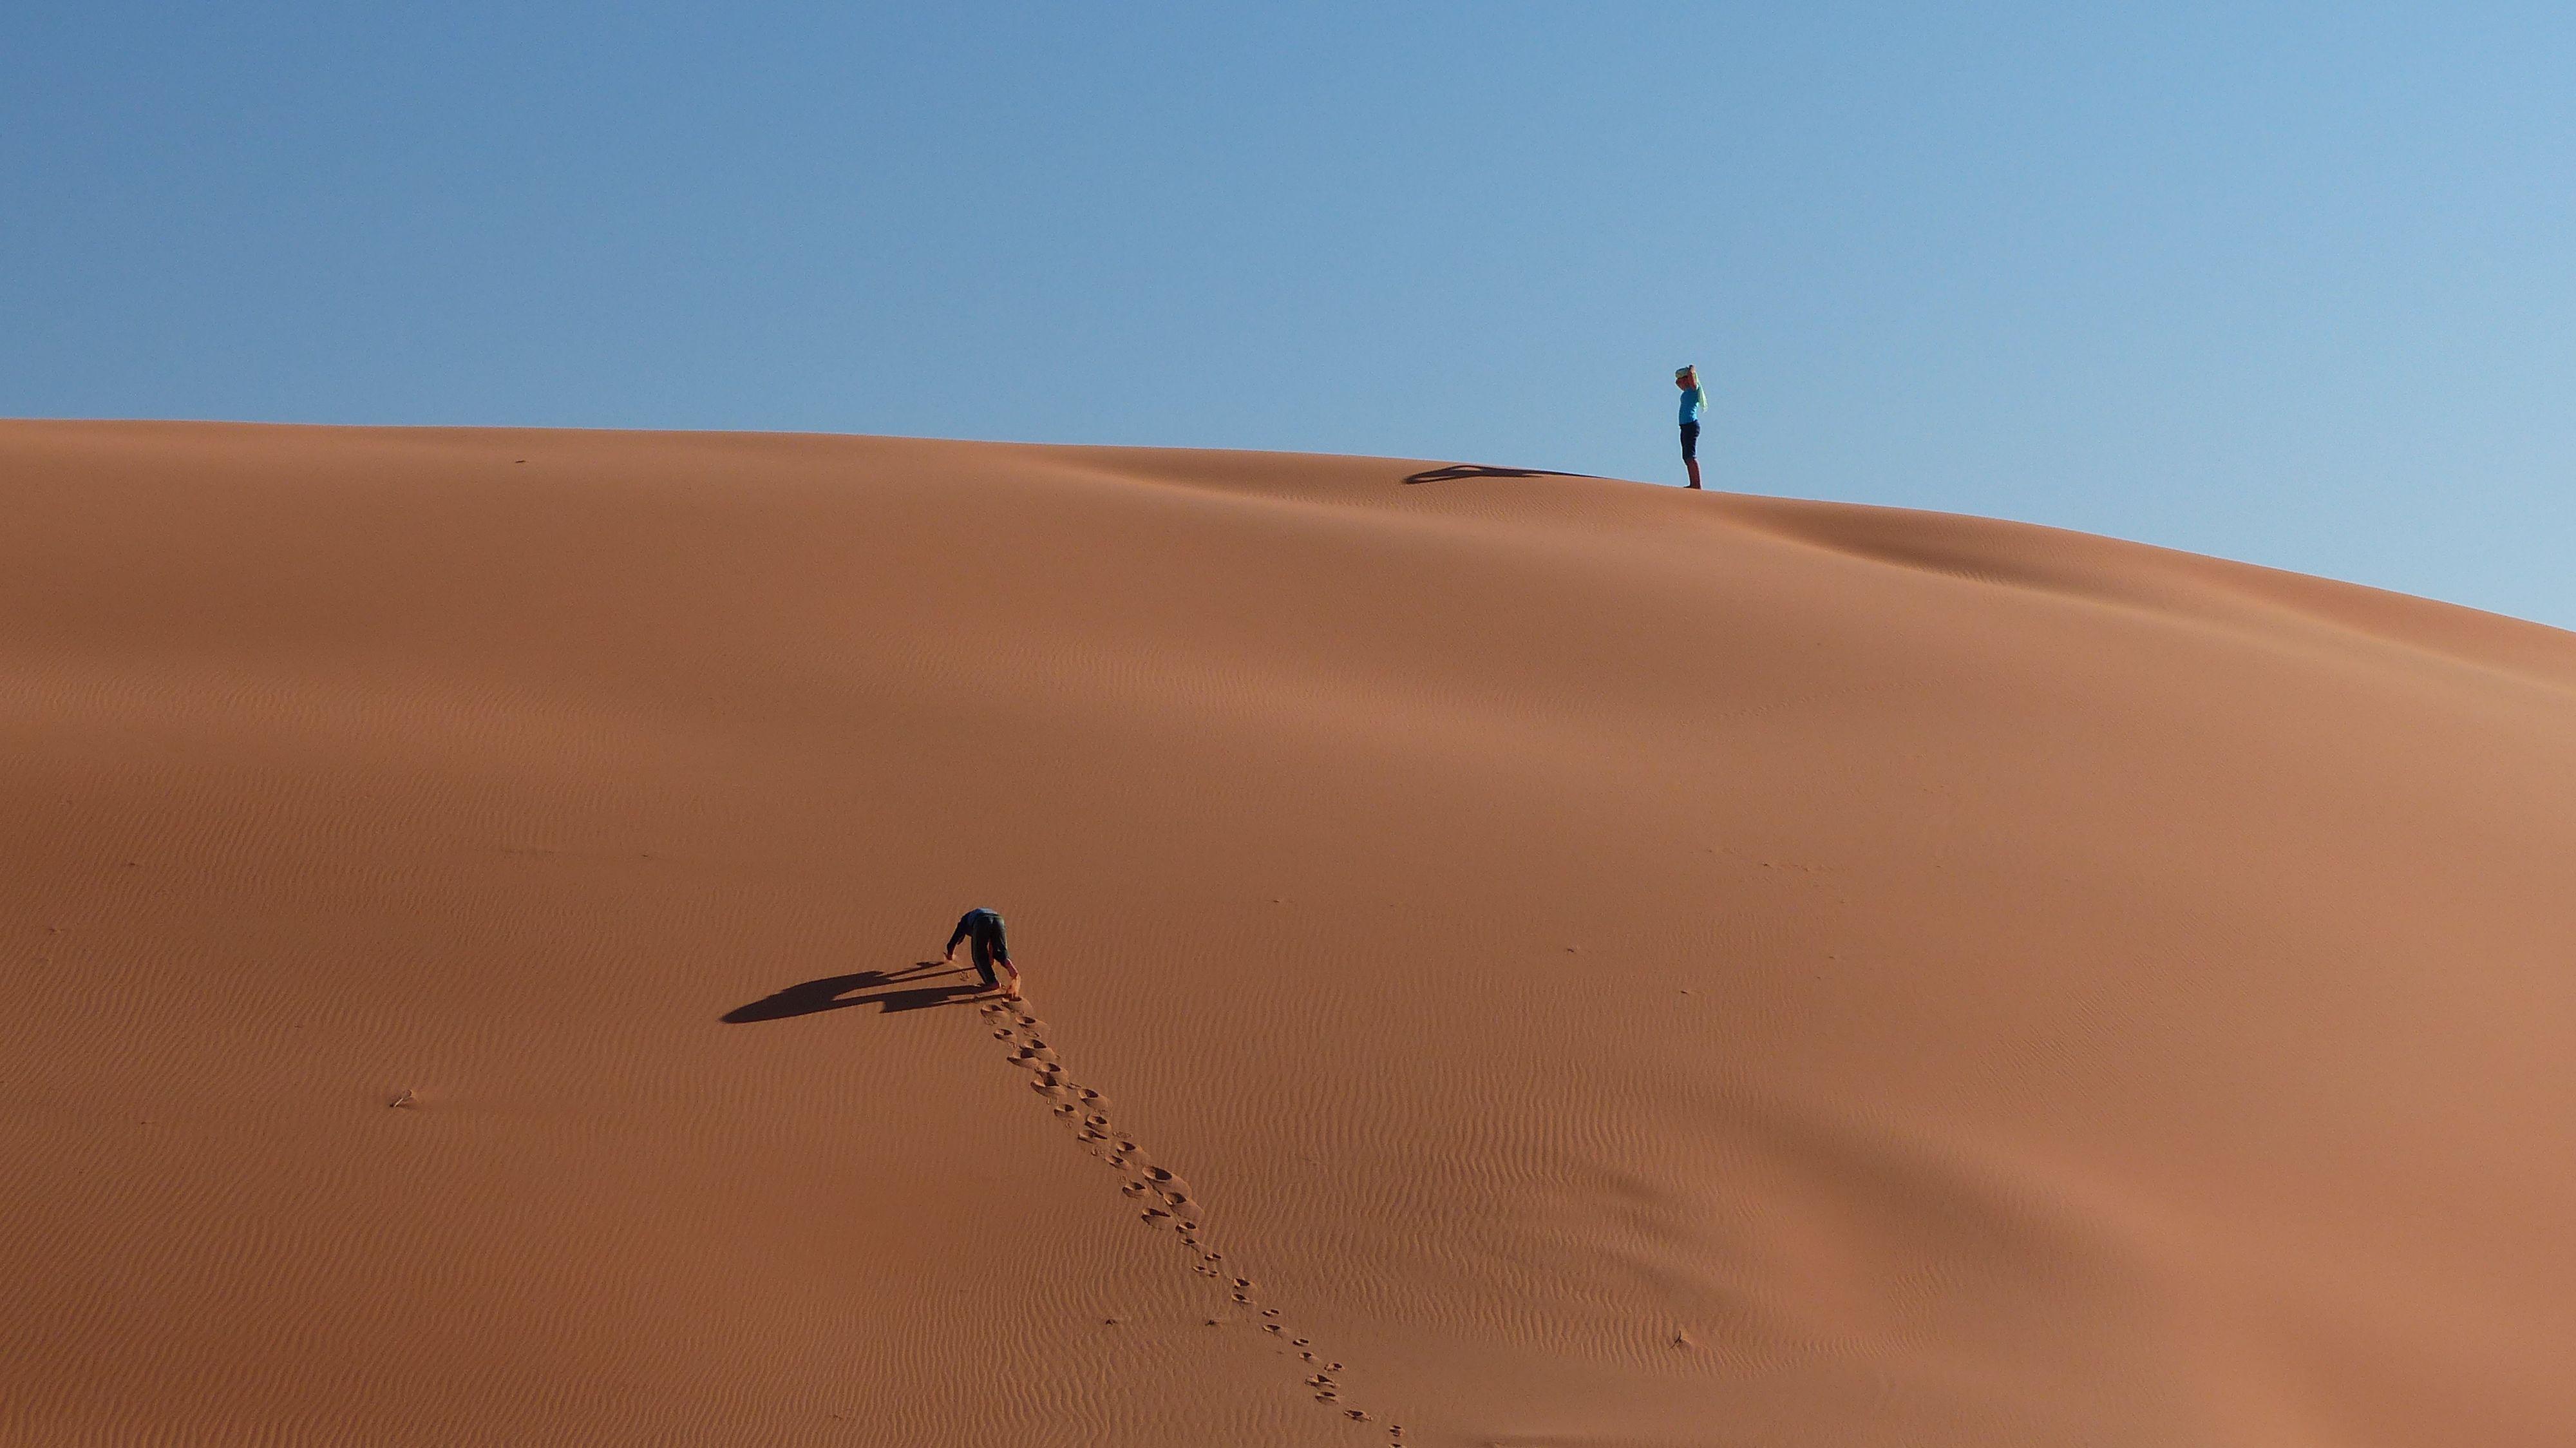 steep sand dune pursued - HD4000×2248